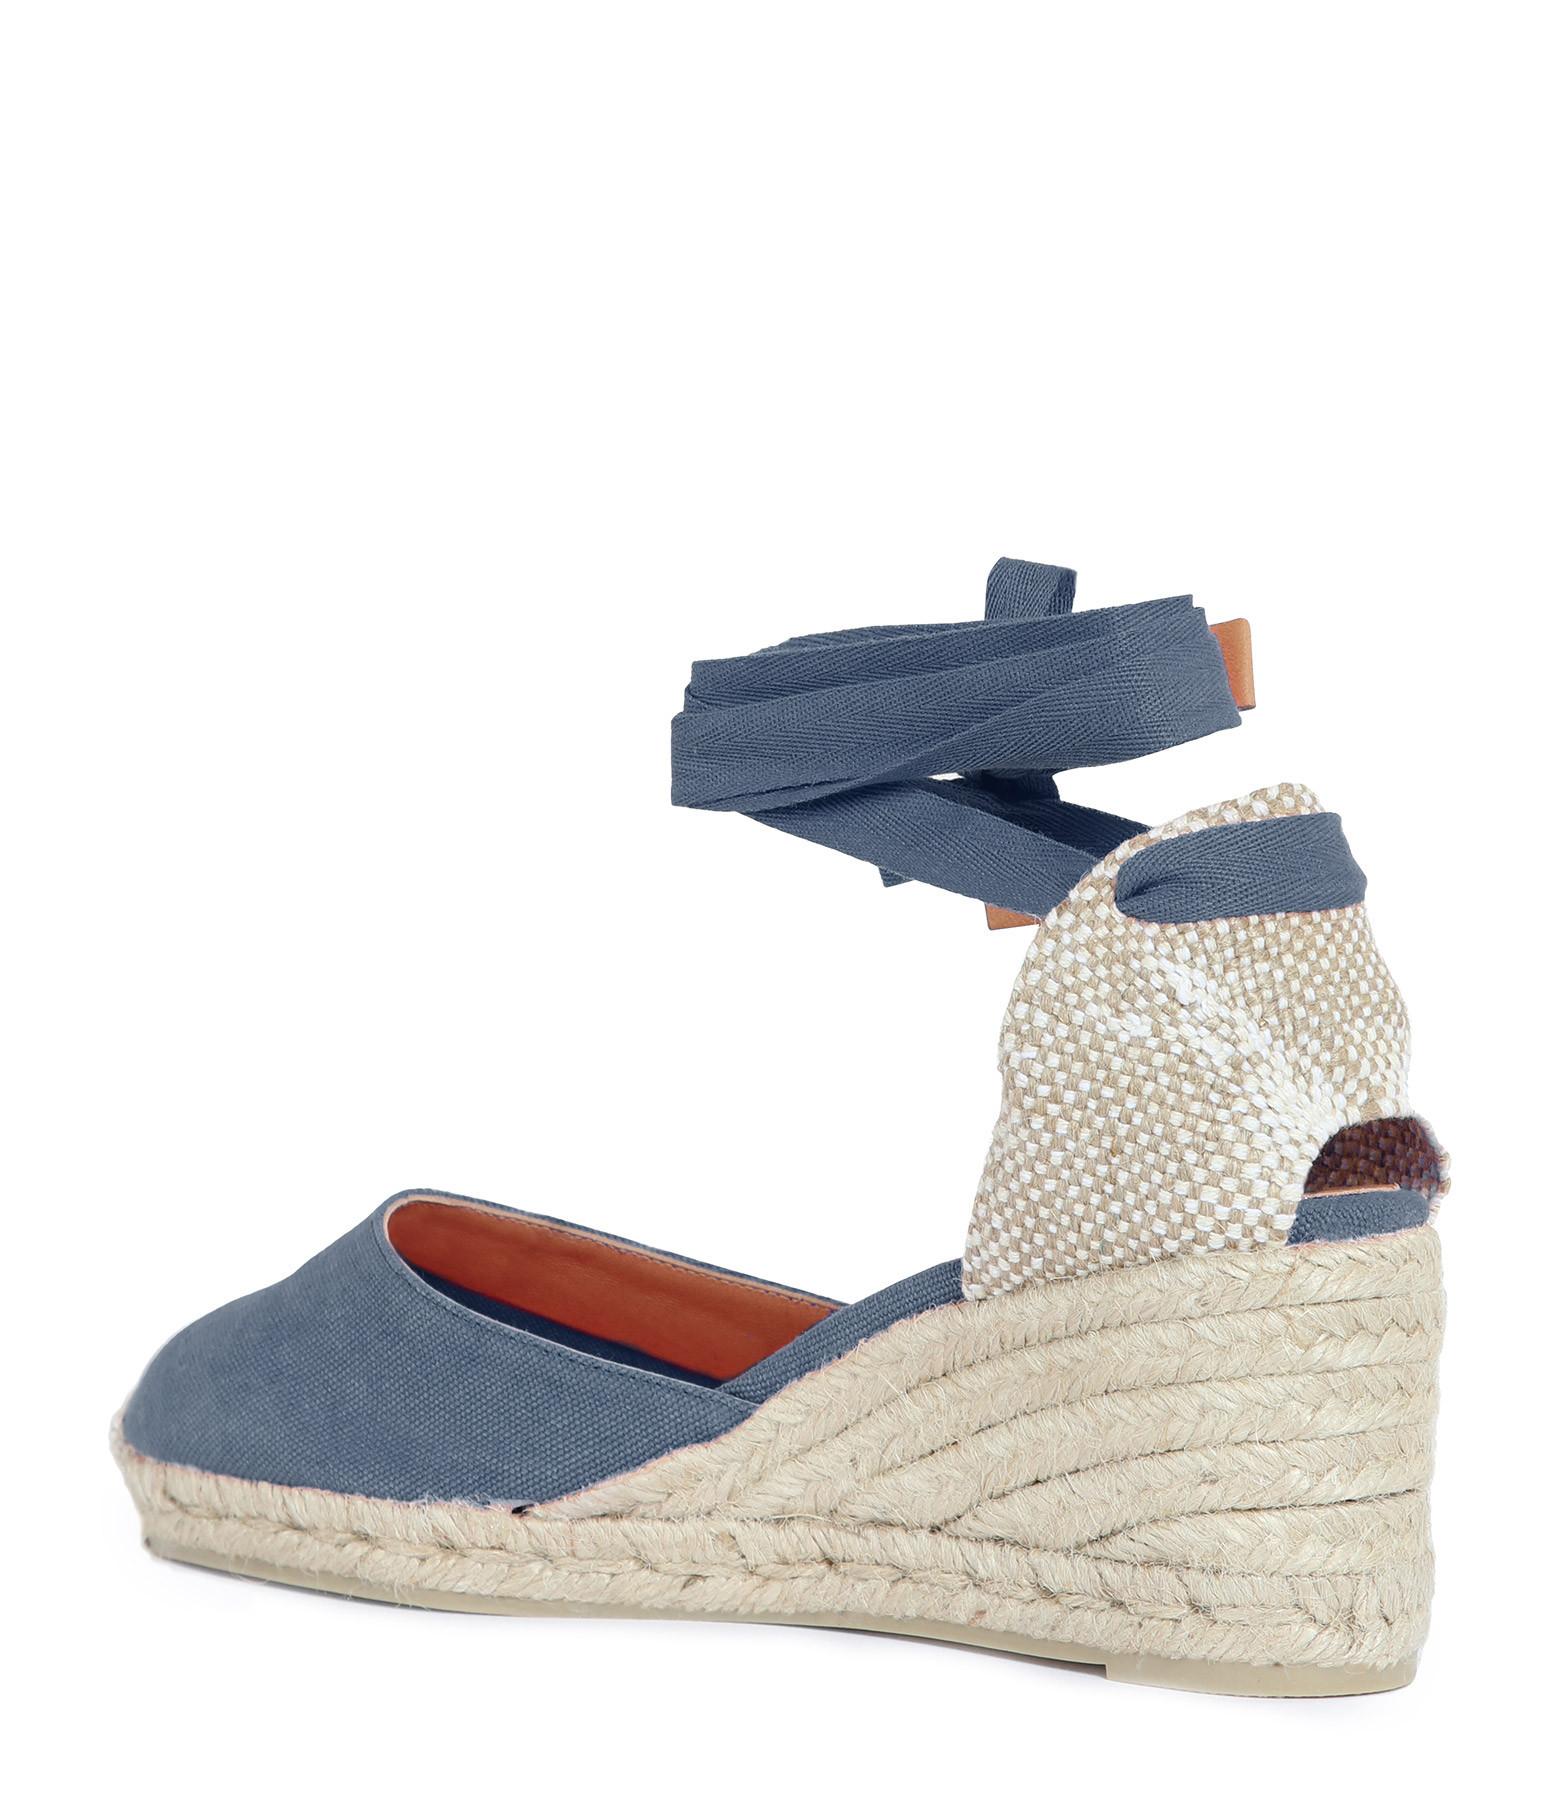 CASTAÑER - Sandales Carina Bleu Jean